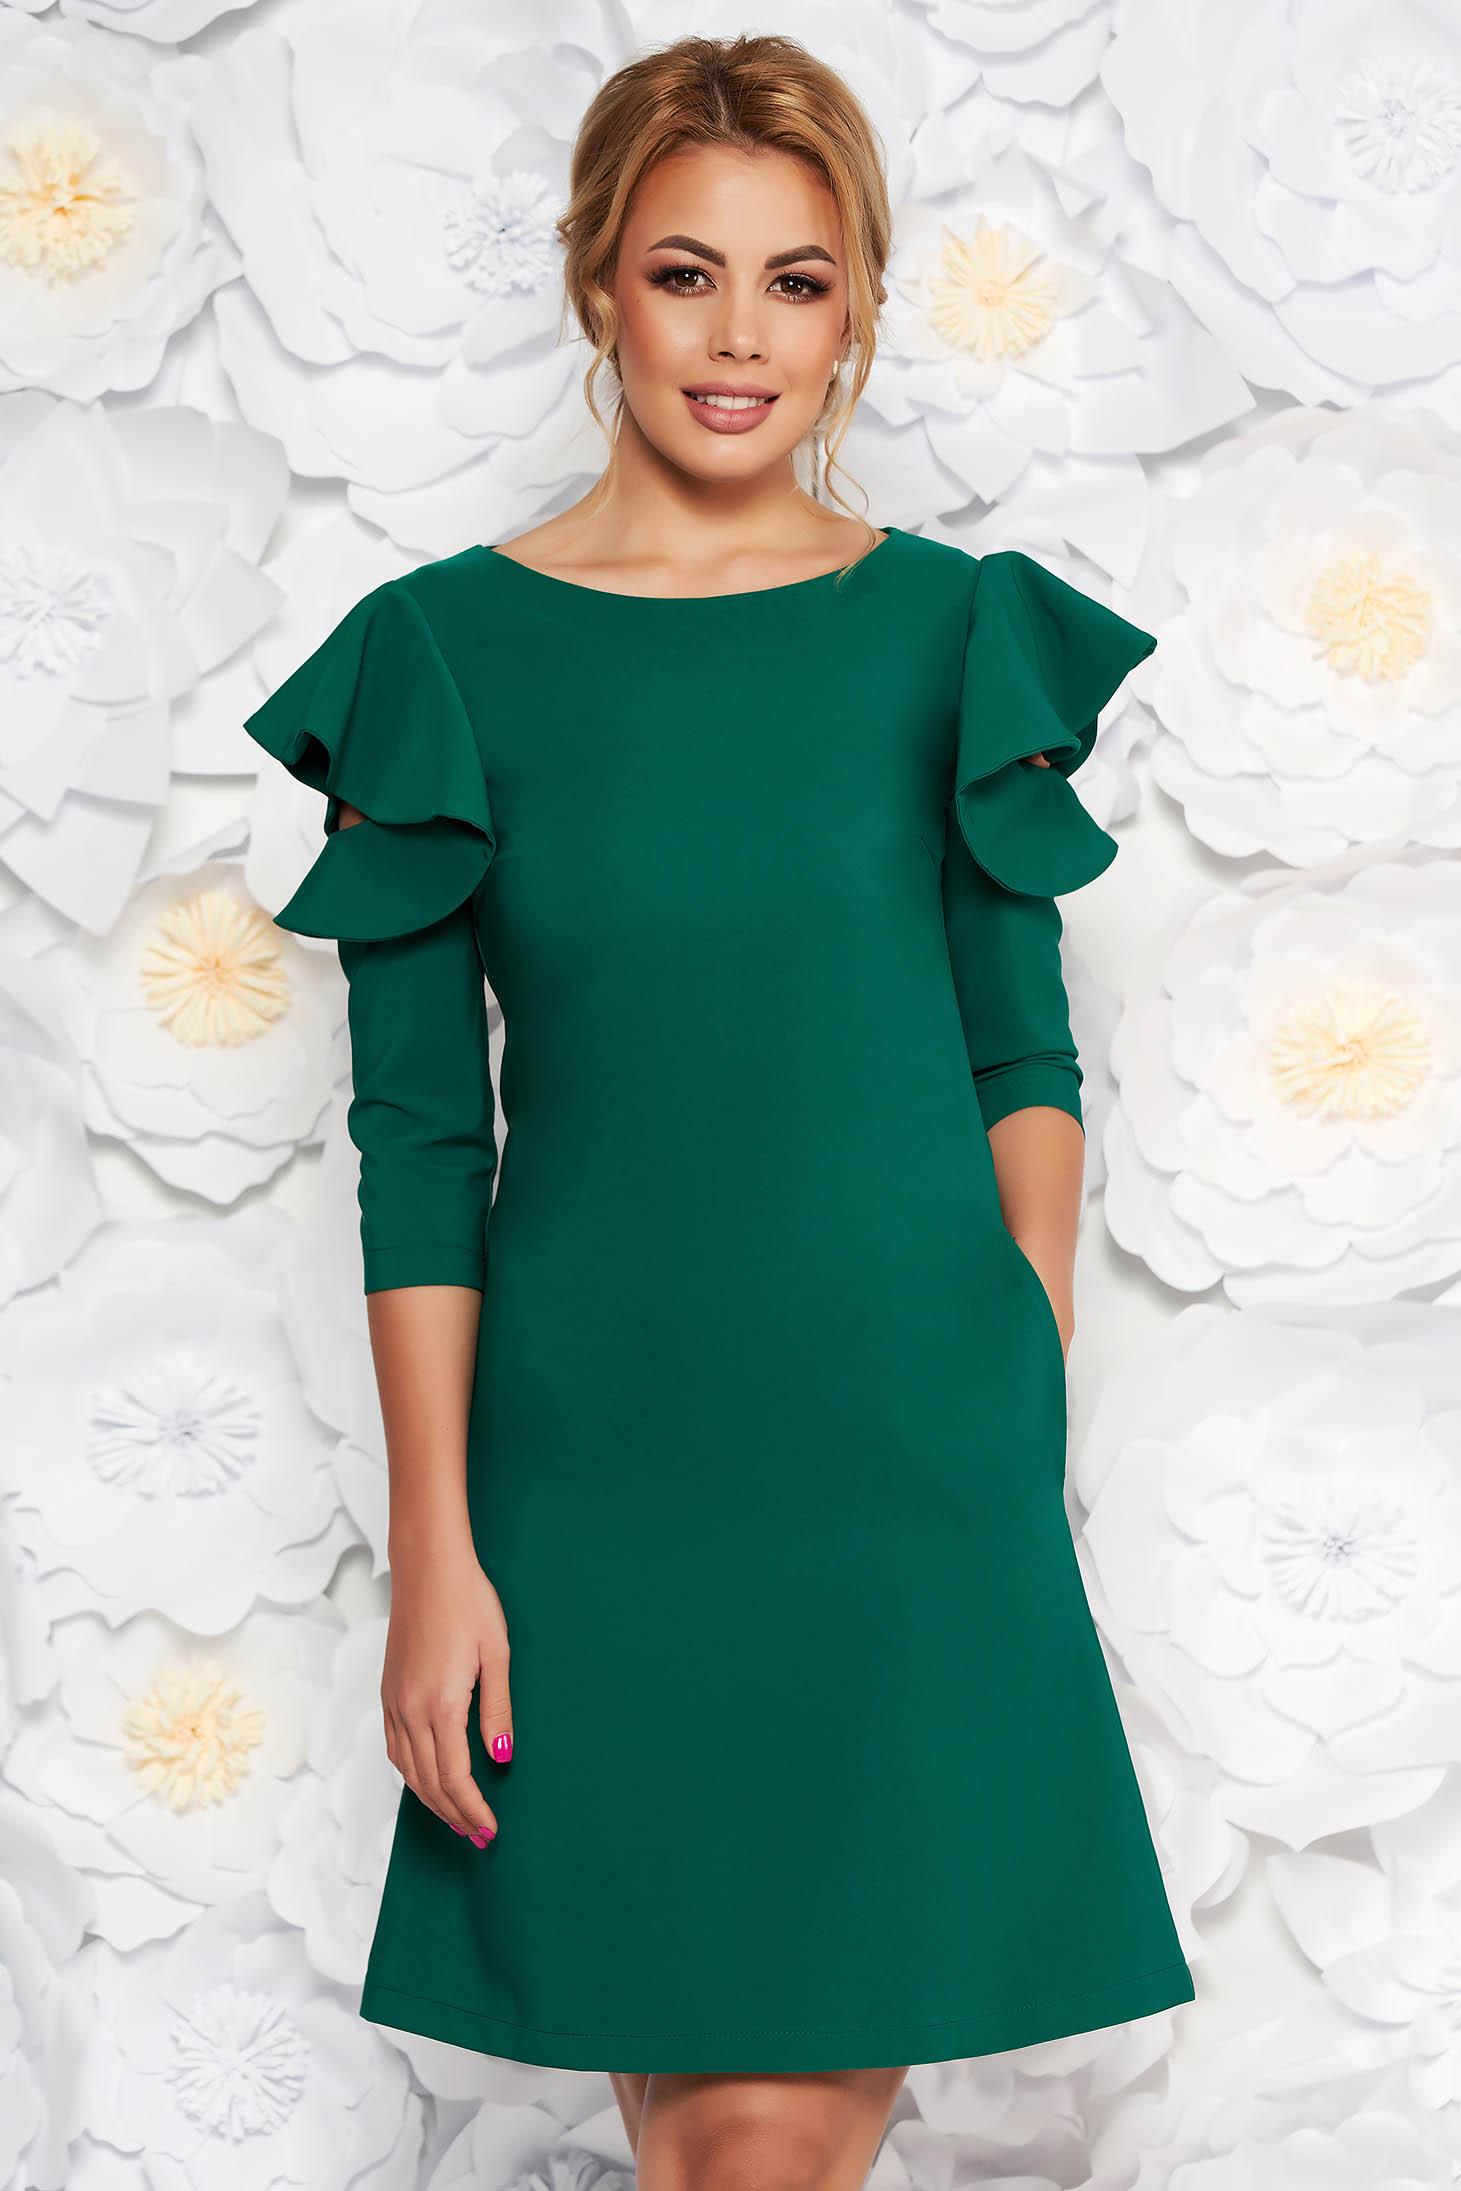 Lightgreen daily elegant a-line dress slightly elastic fabric with ruffled sleeves